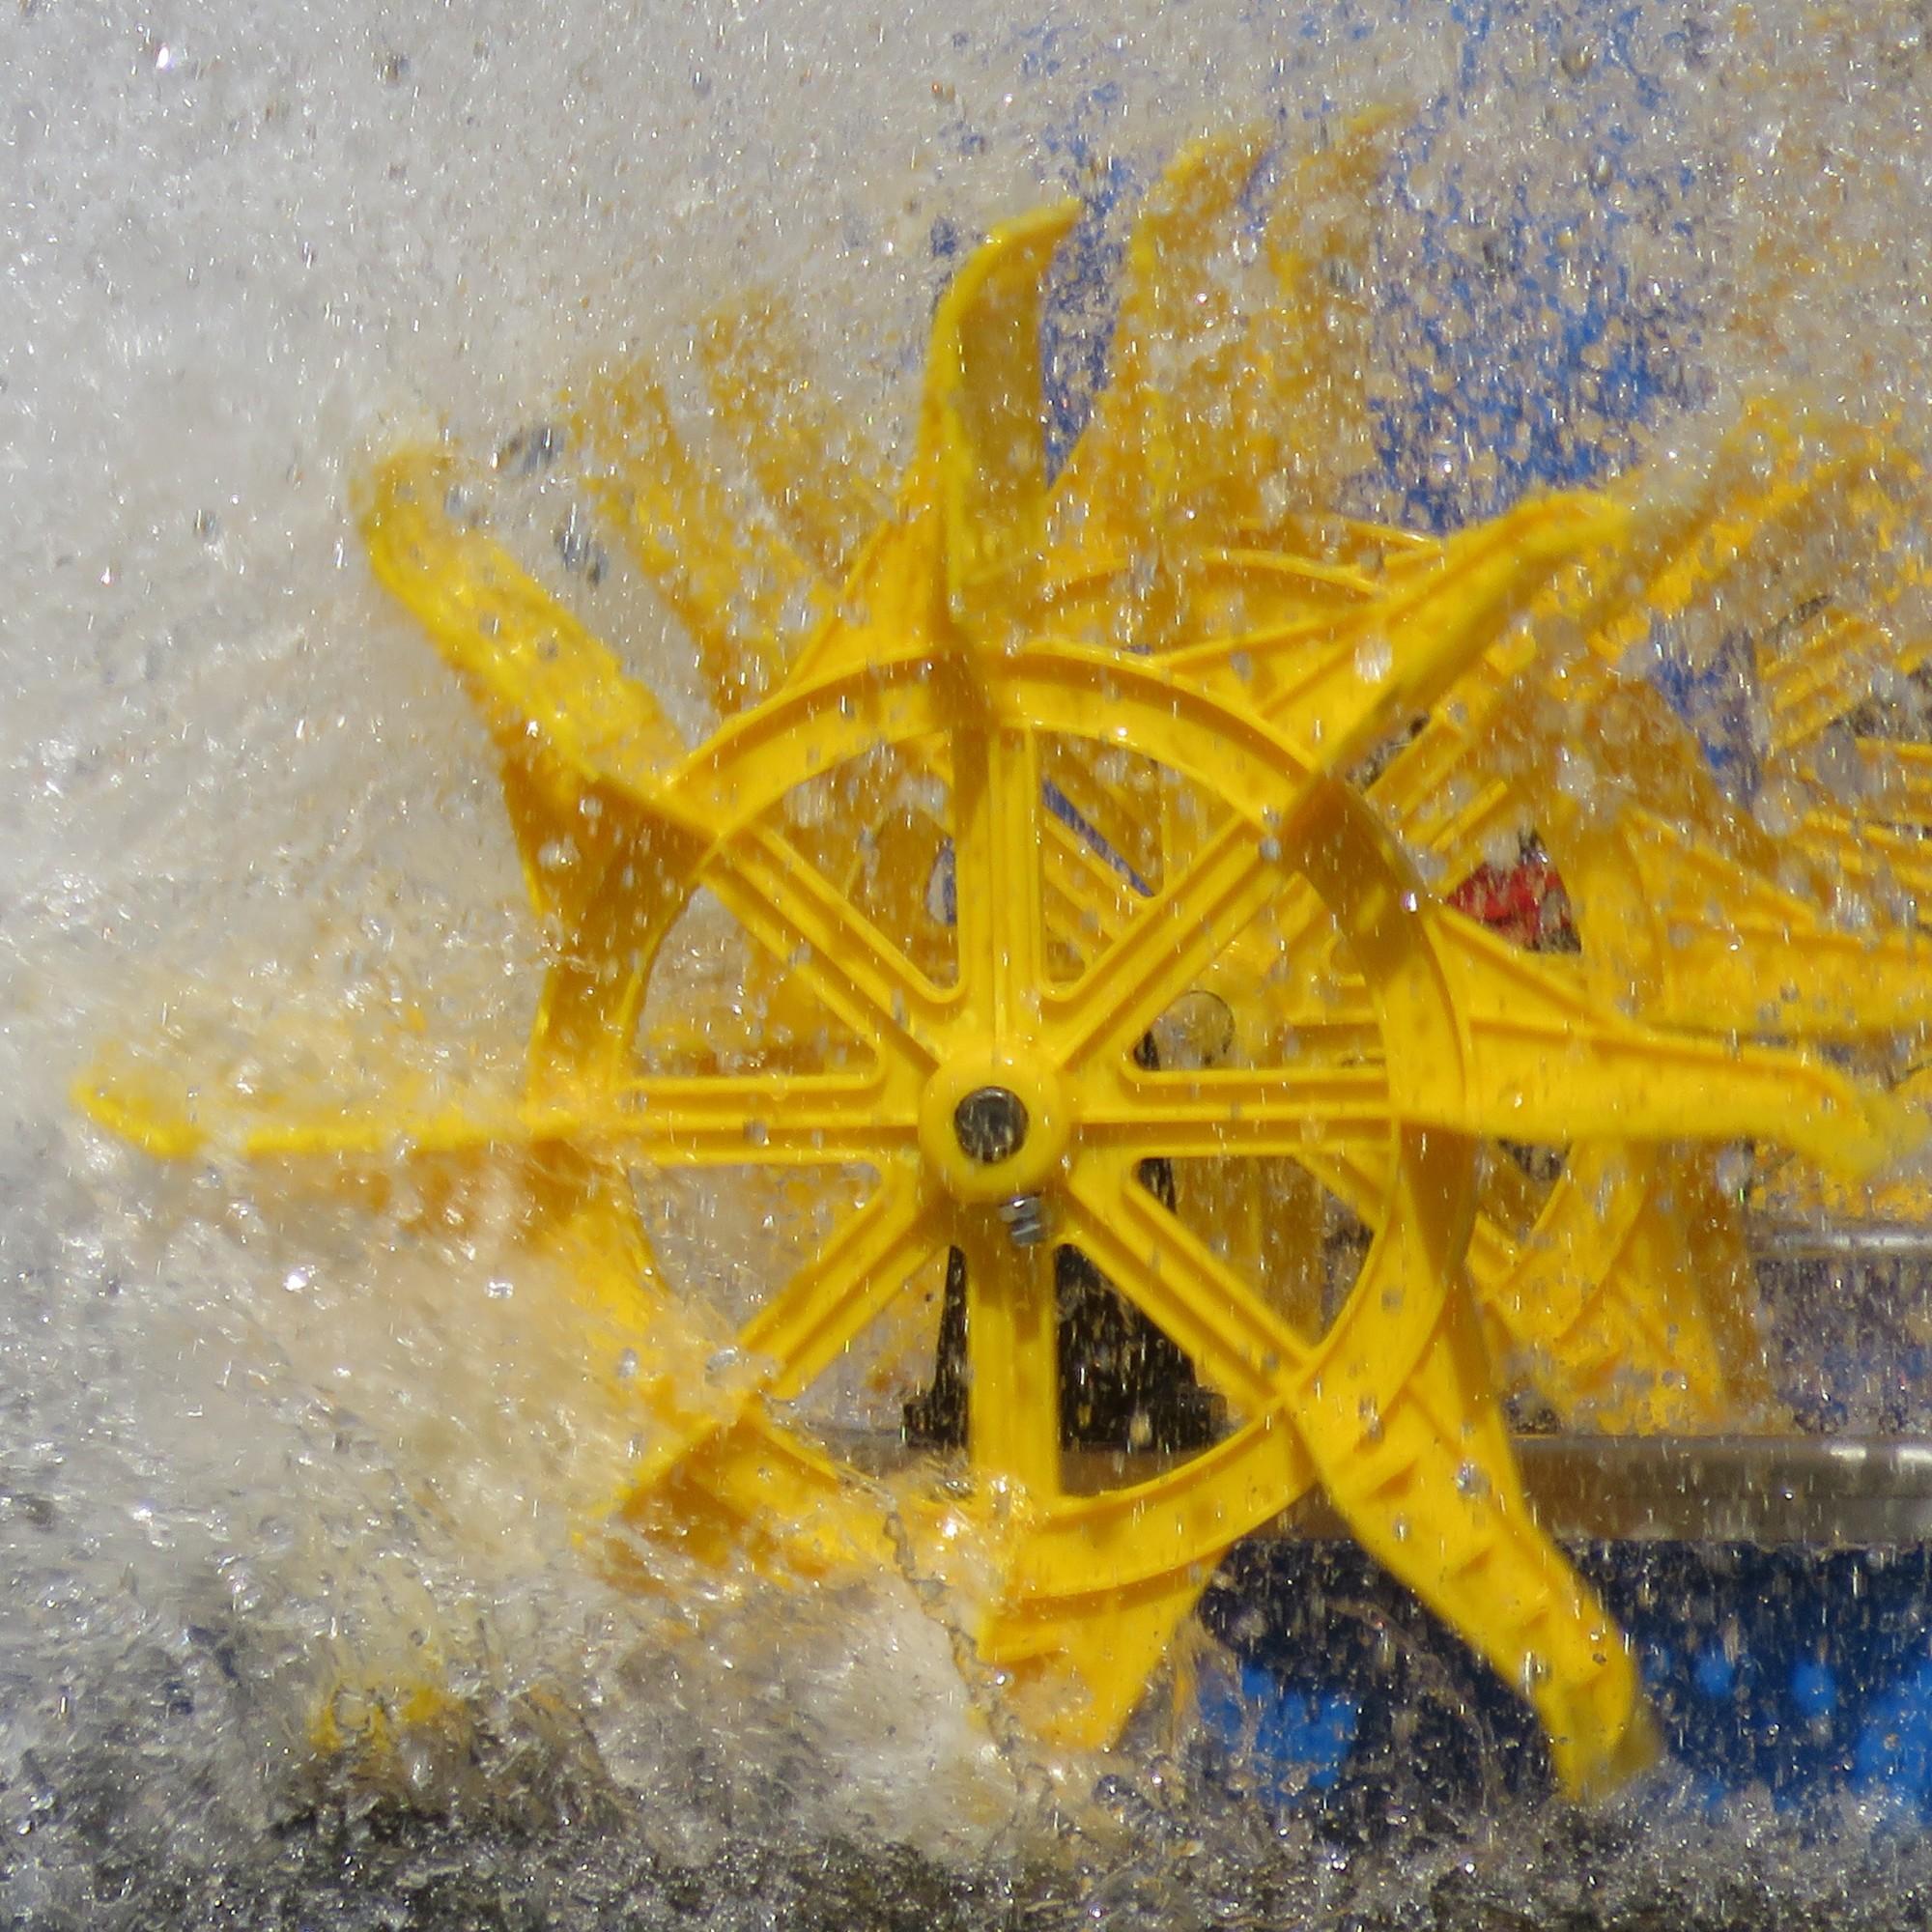 Wasserrad, Symbolbild